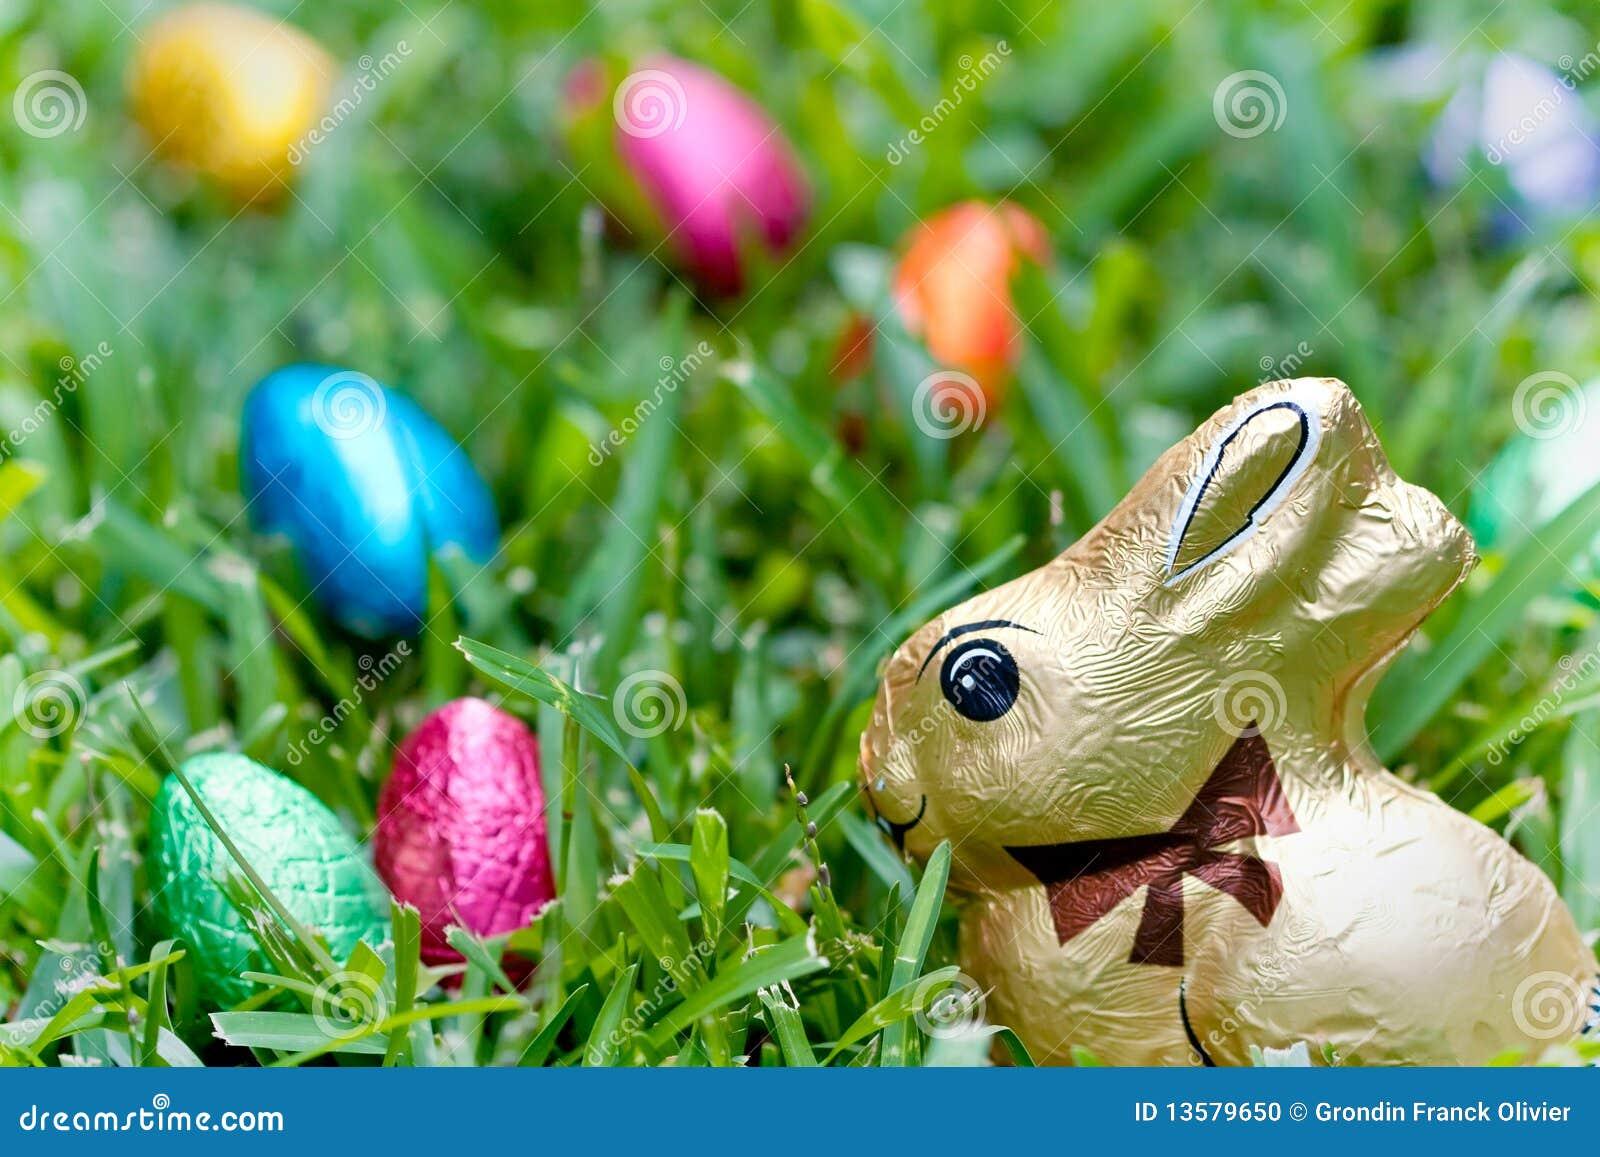 Chocolate bunny and eggs